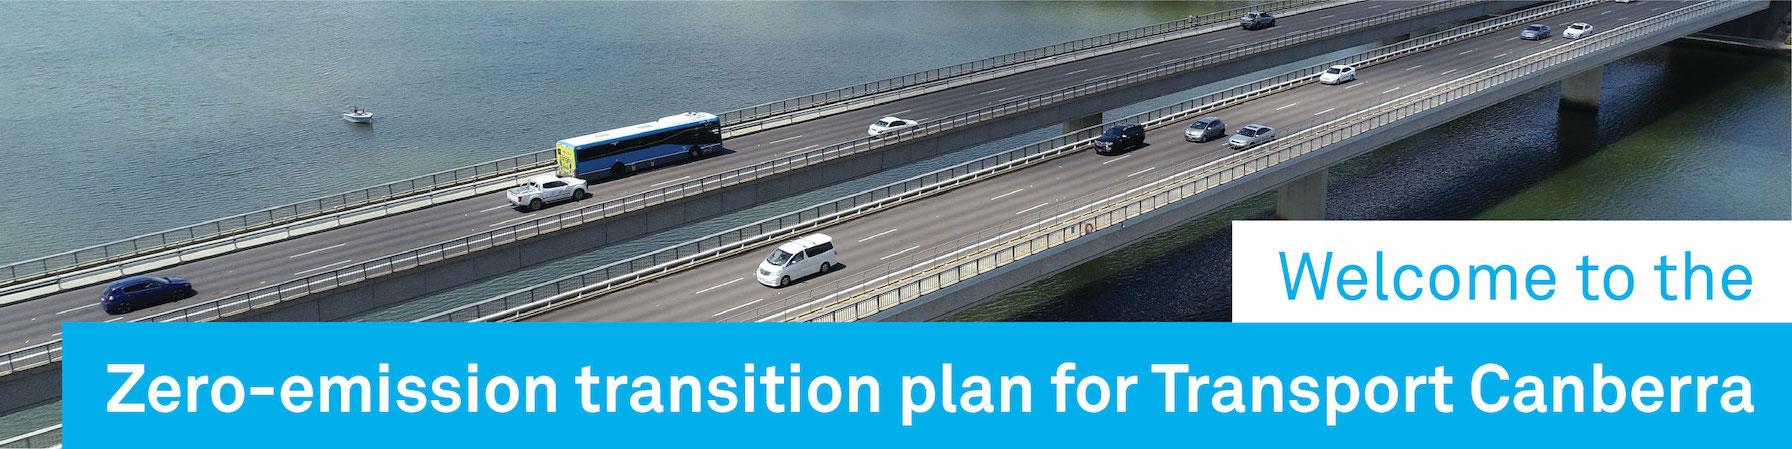 Zero emissions transition plan for Transport Canberra